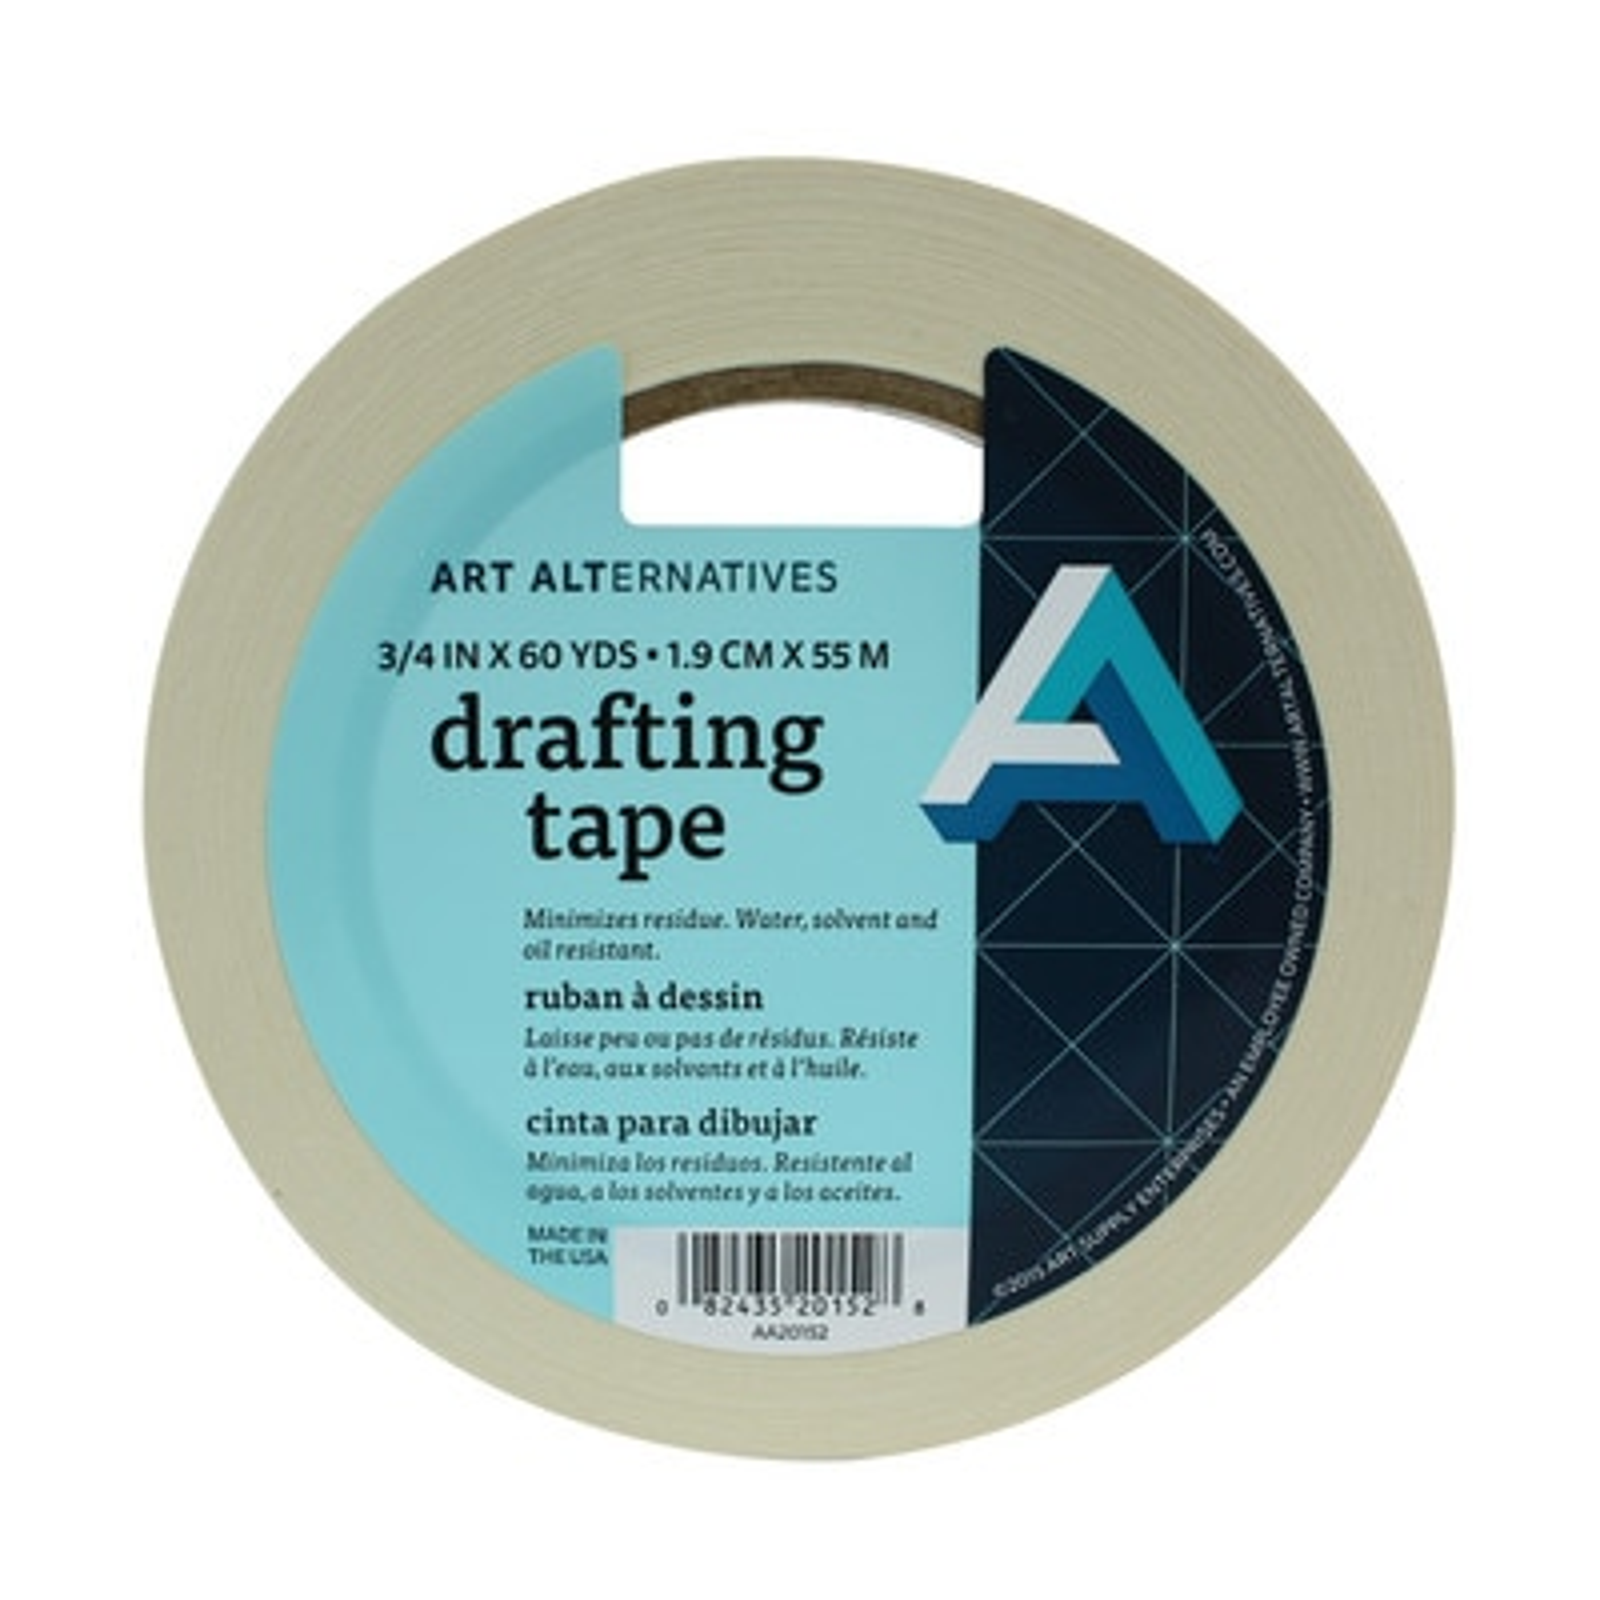 Drafting Tape 3/4 x 60 Yds